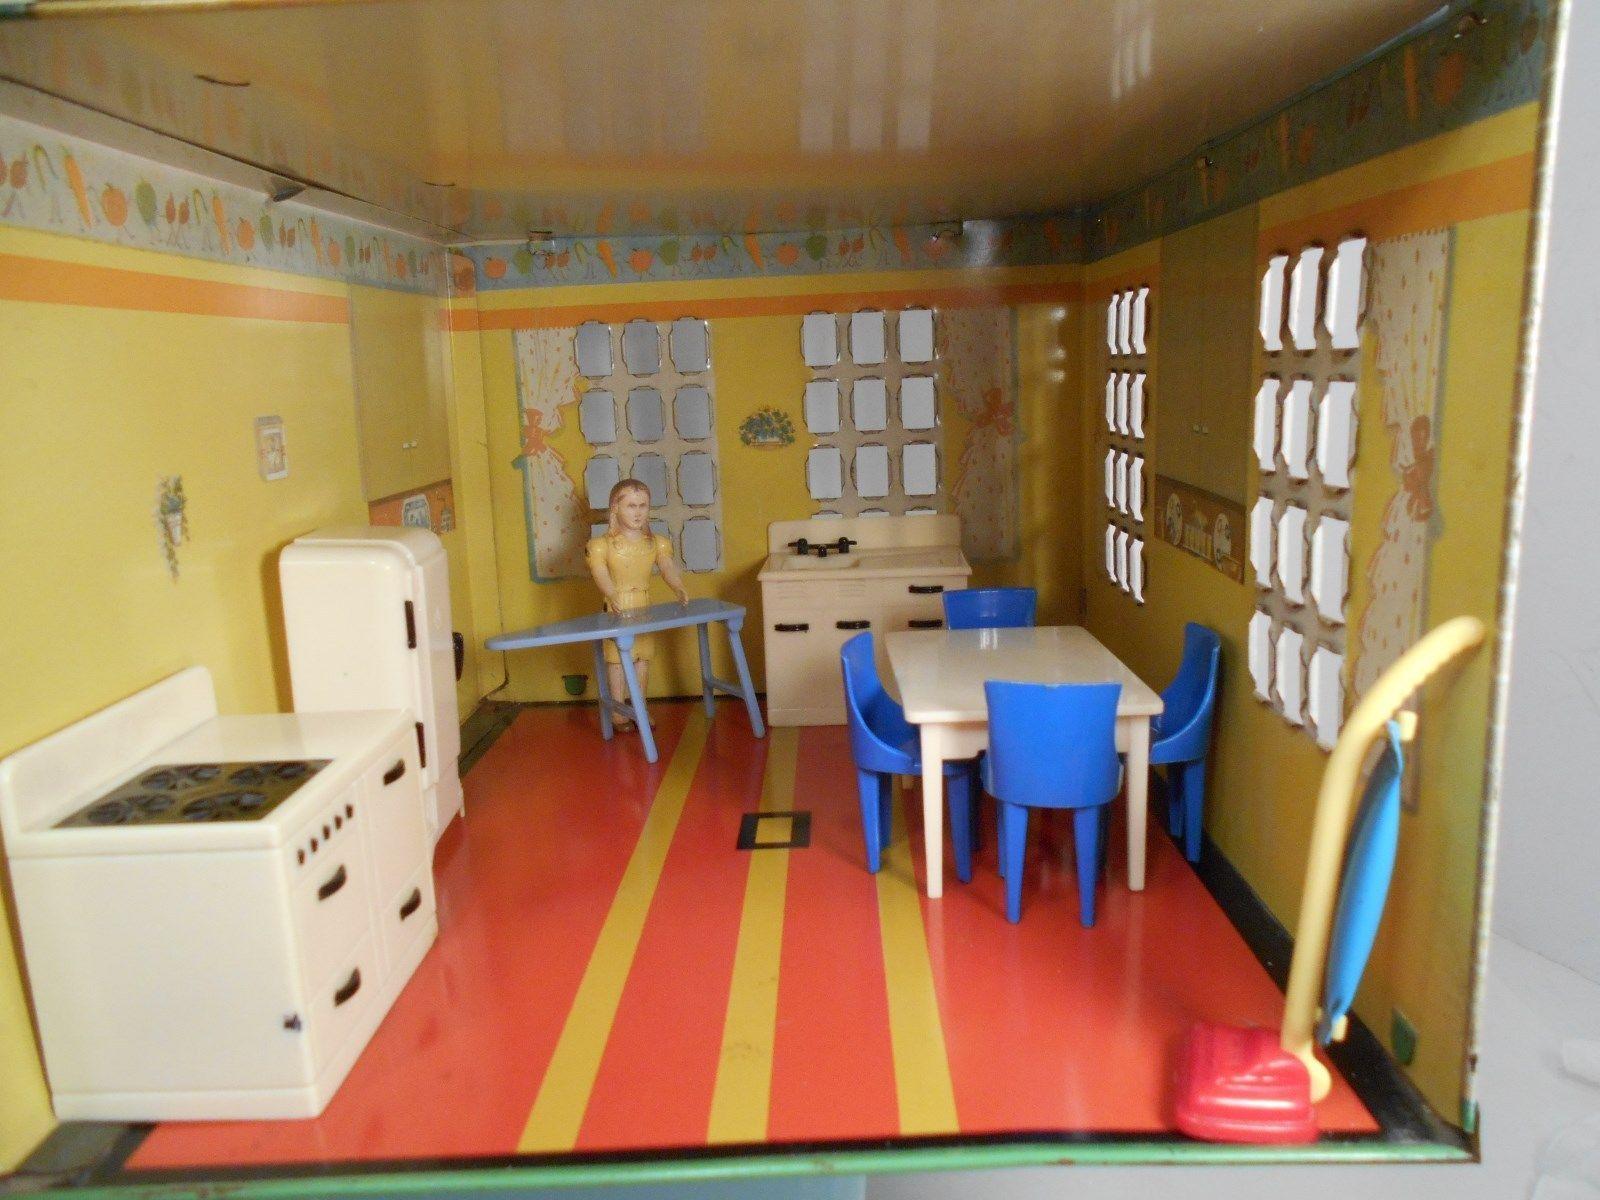 1948 F.W. Woolworthu0027s PLAYSTEEL Tin Litho DOLLHOUSE 5 Room Fully Furnished 1 :16 | EBay